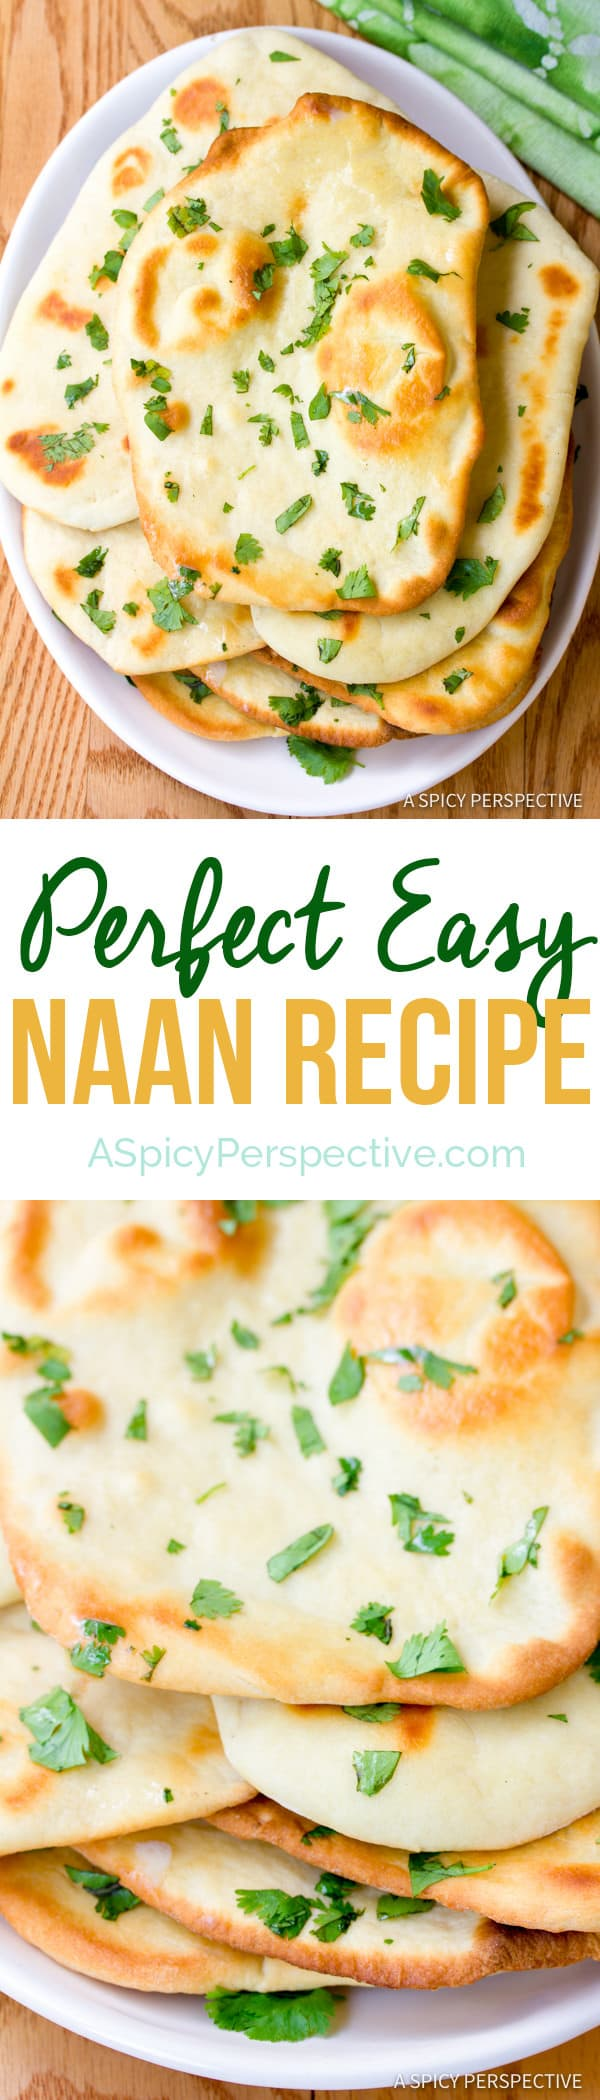 Perfect Easy Naan Recipe | ASpicyPerspective.com